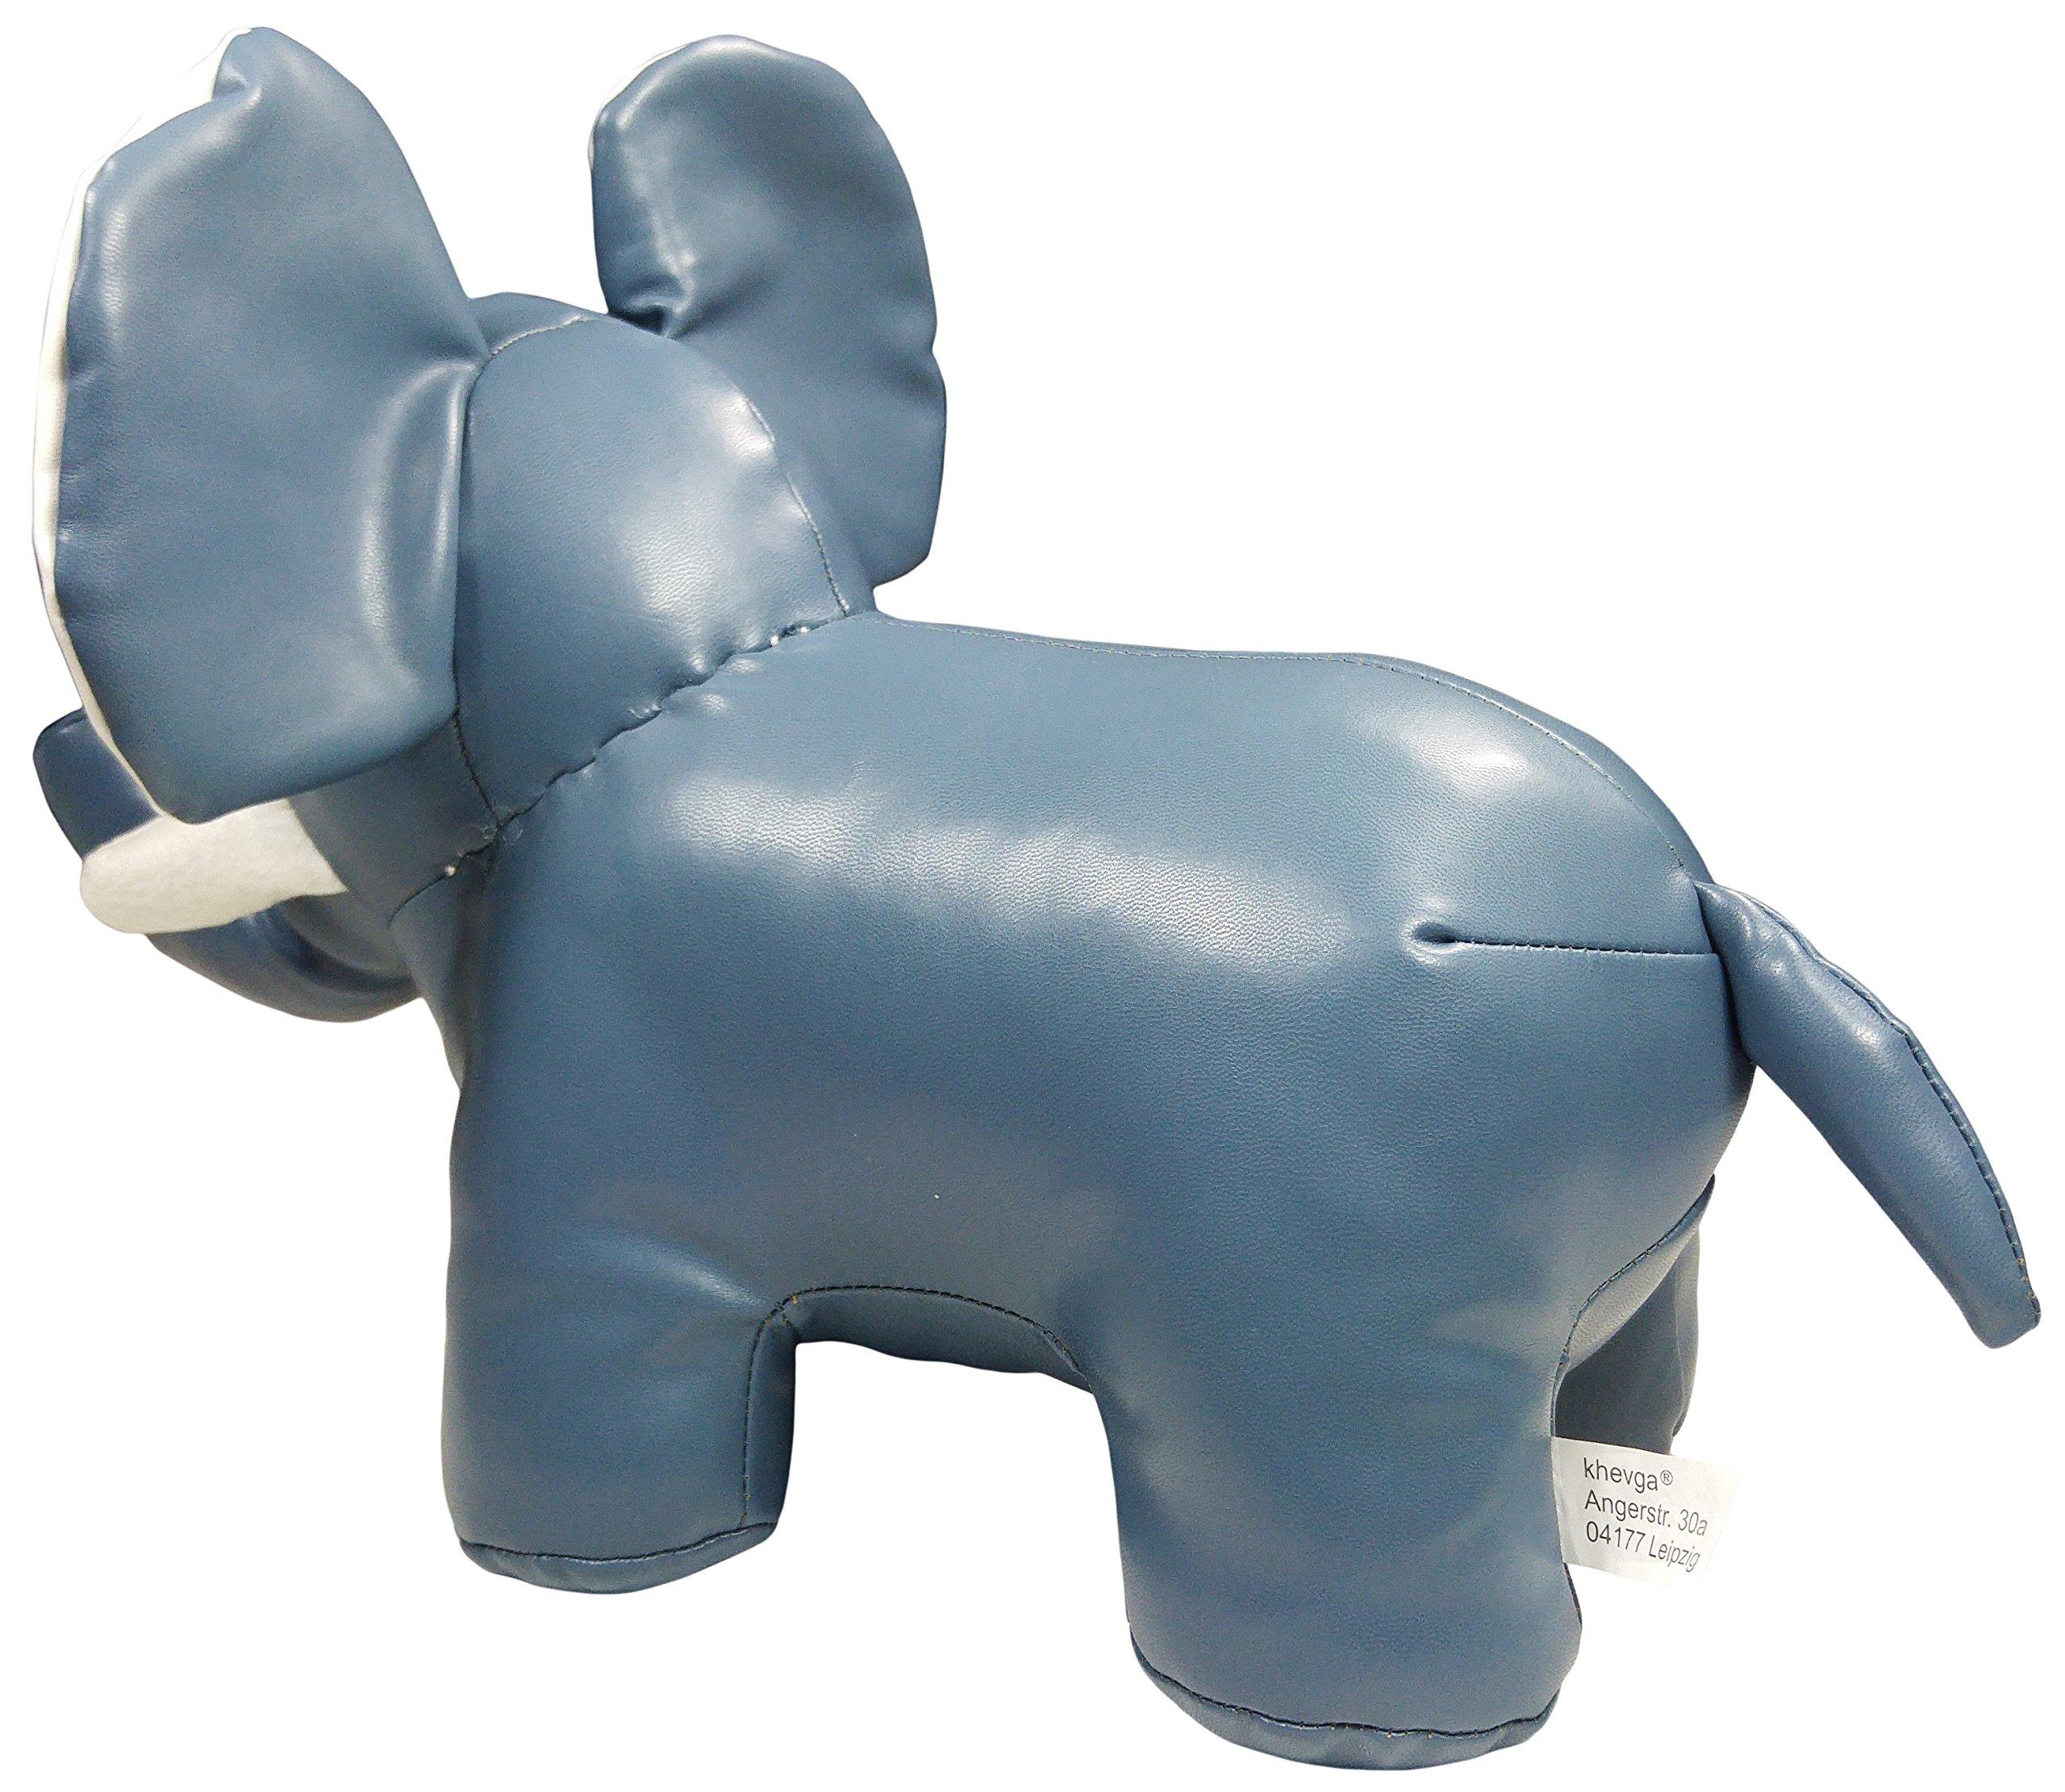 khevga Leather Optic Elephant Gray White Animal Door Stopper by khevga (Image #3)